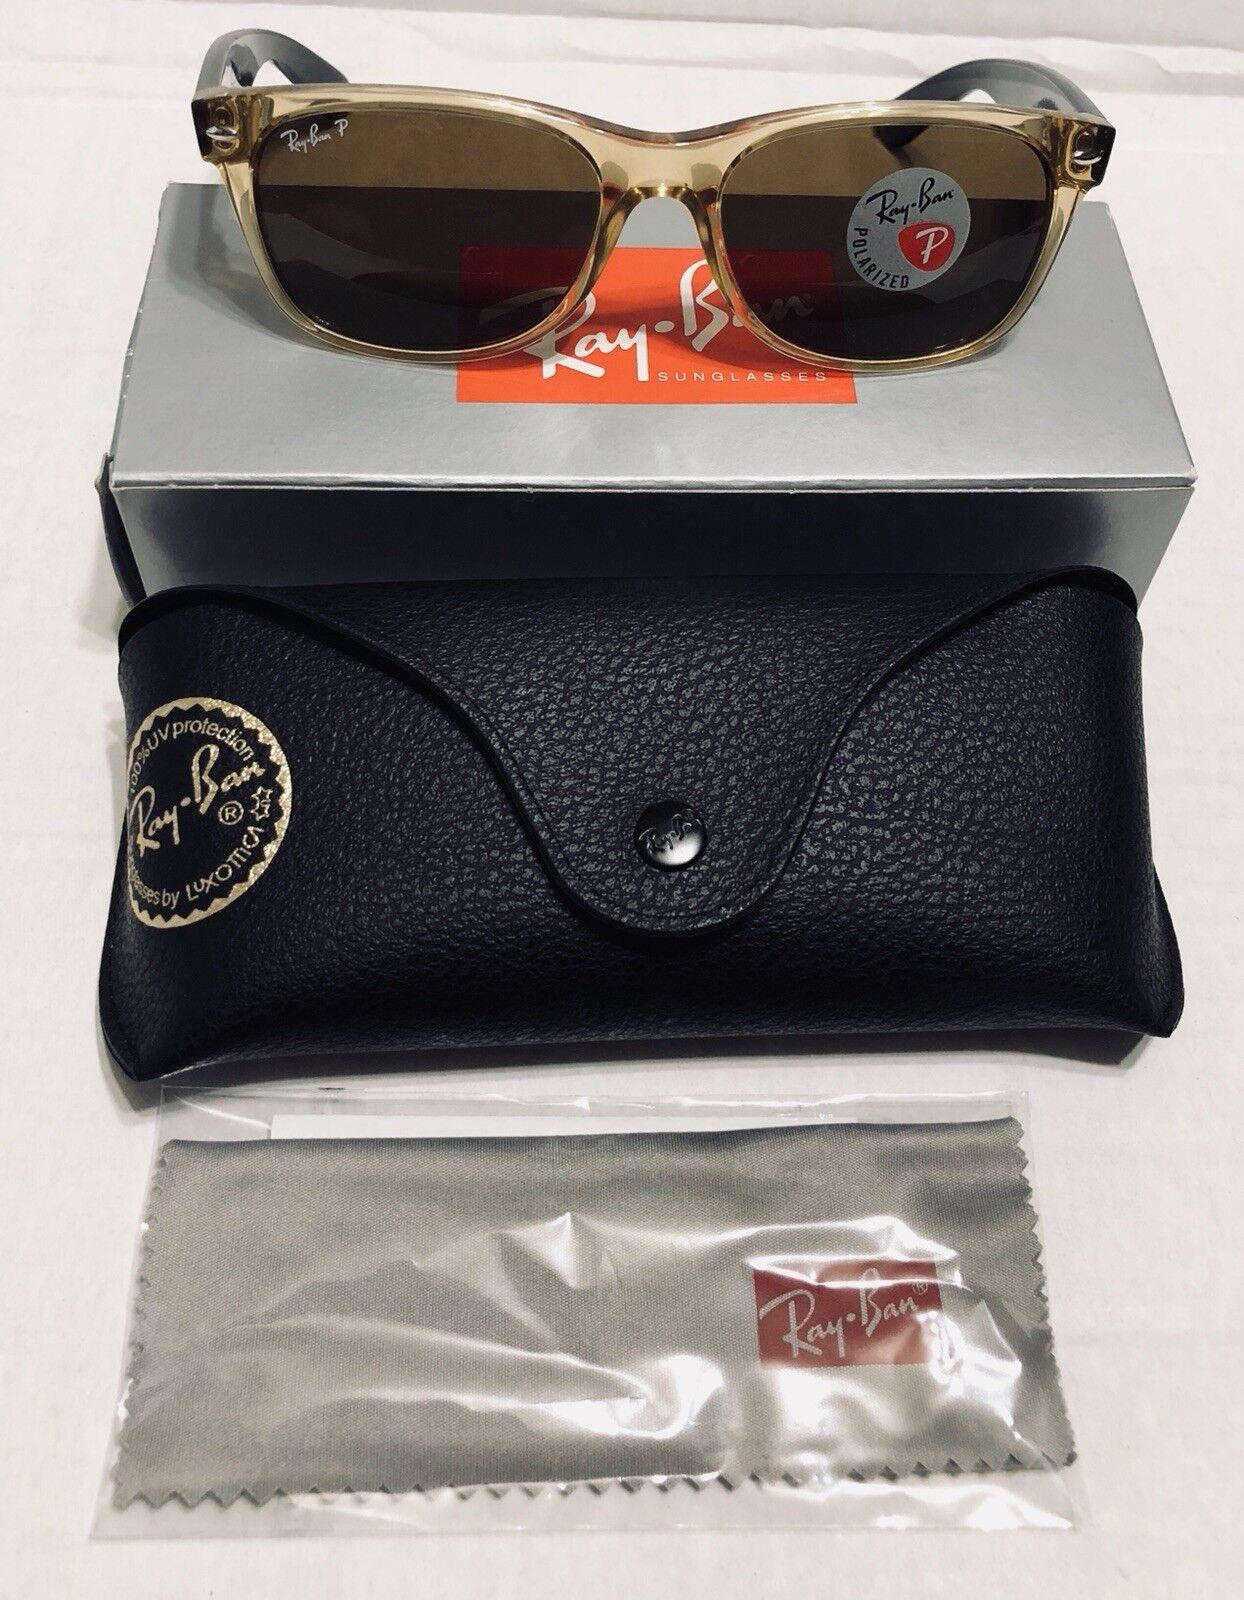 7df292e548 ... australia ray ban rb 2132 55mm 18 wayfarer honey and black polarized  sunglasses ebay bed7f b6155